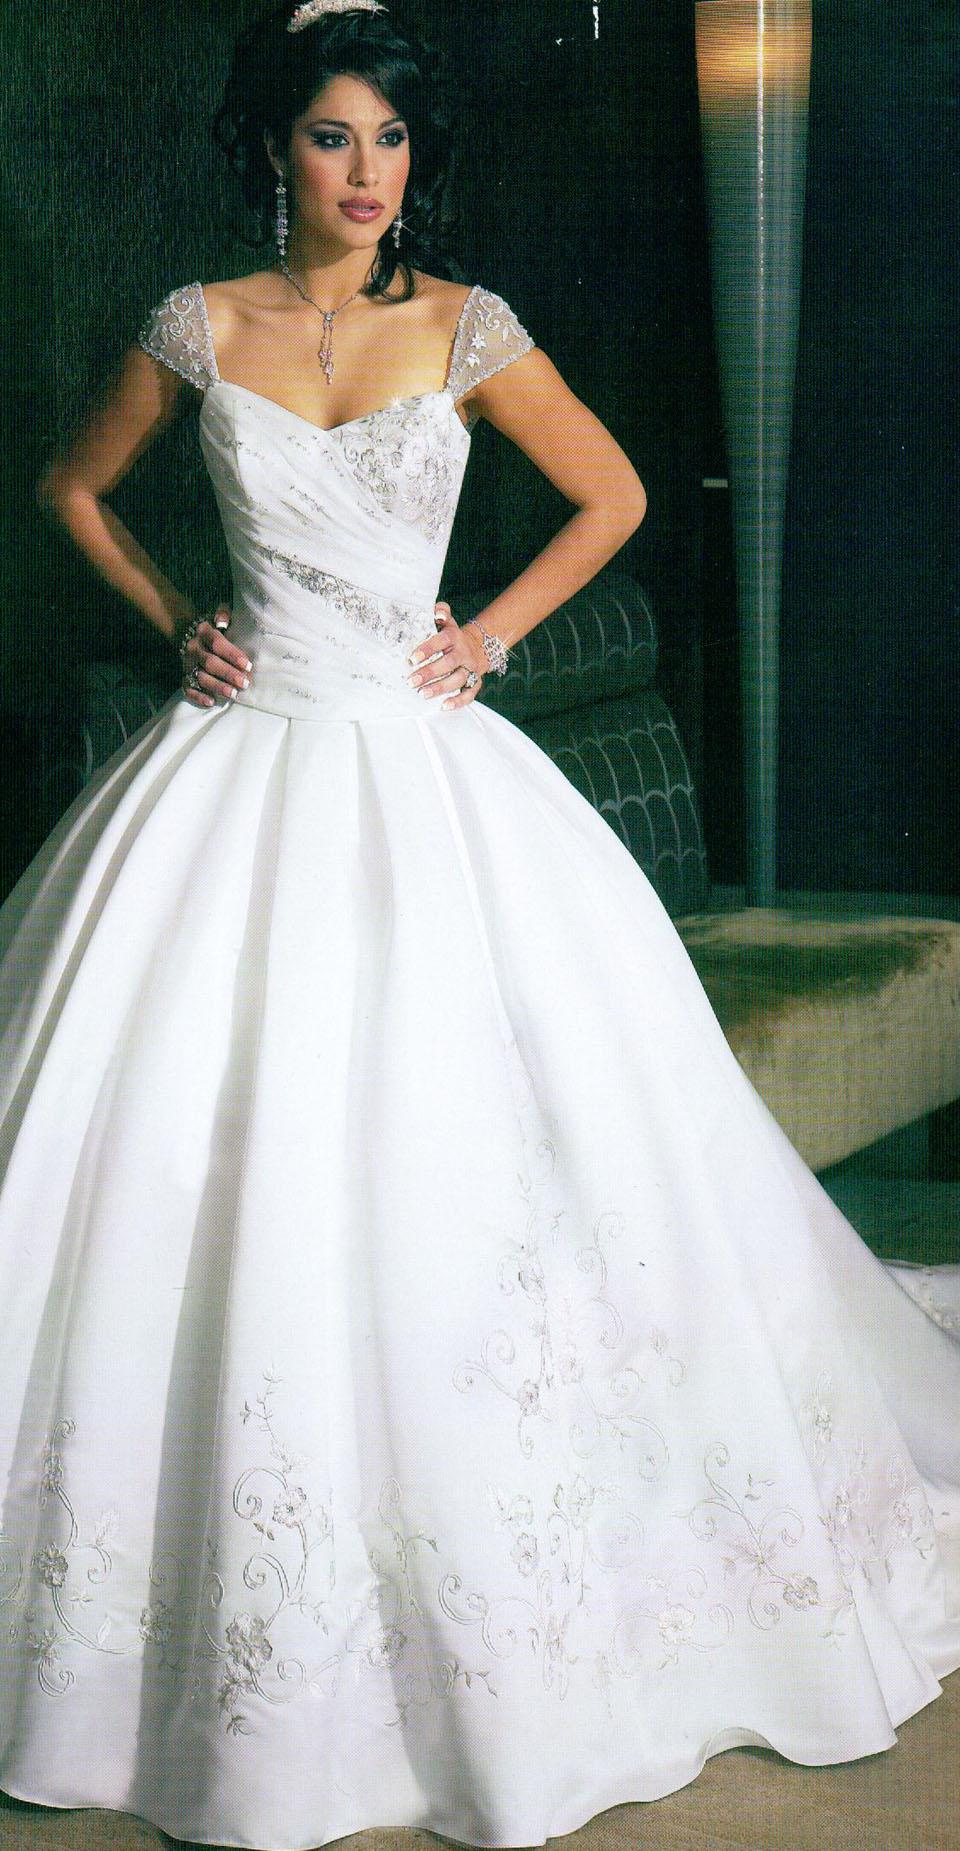 wedding dress las vegas nv wedding dresses las vegas Wedding Dress Las Vegas Nv 76